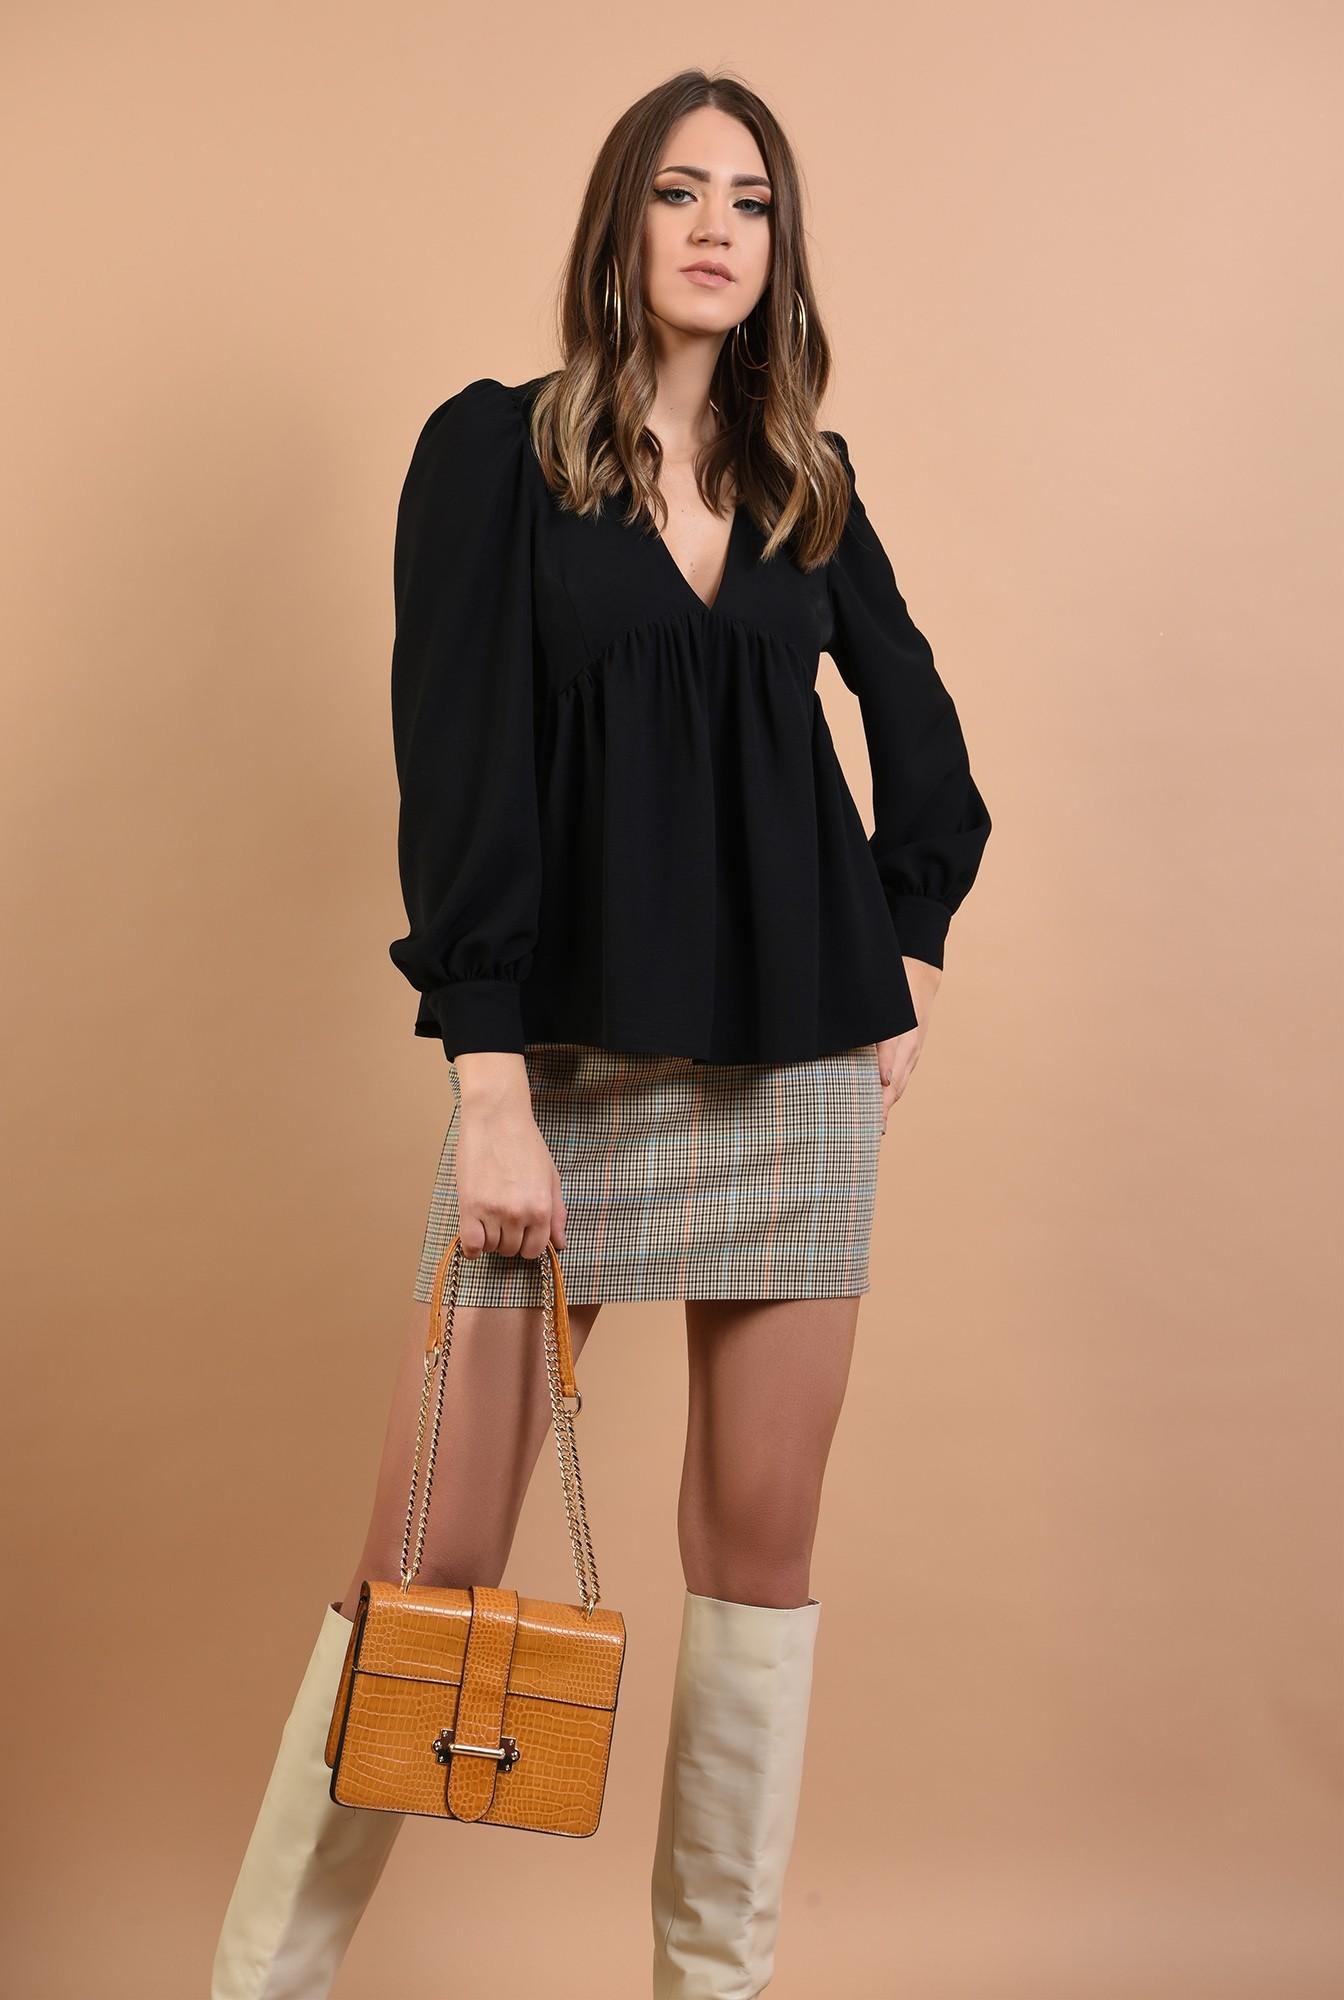 2 - bluza casual, cu peplum, neagra, anchior, Poema